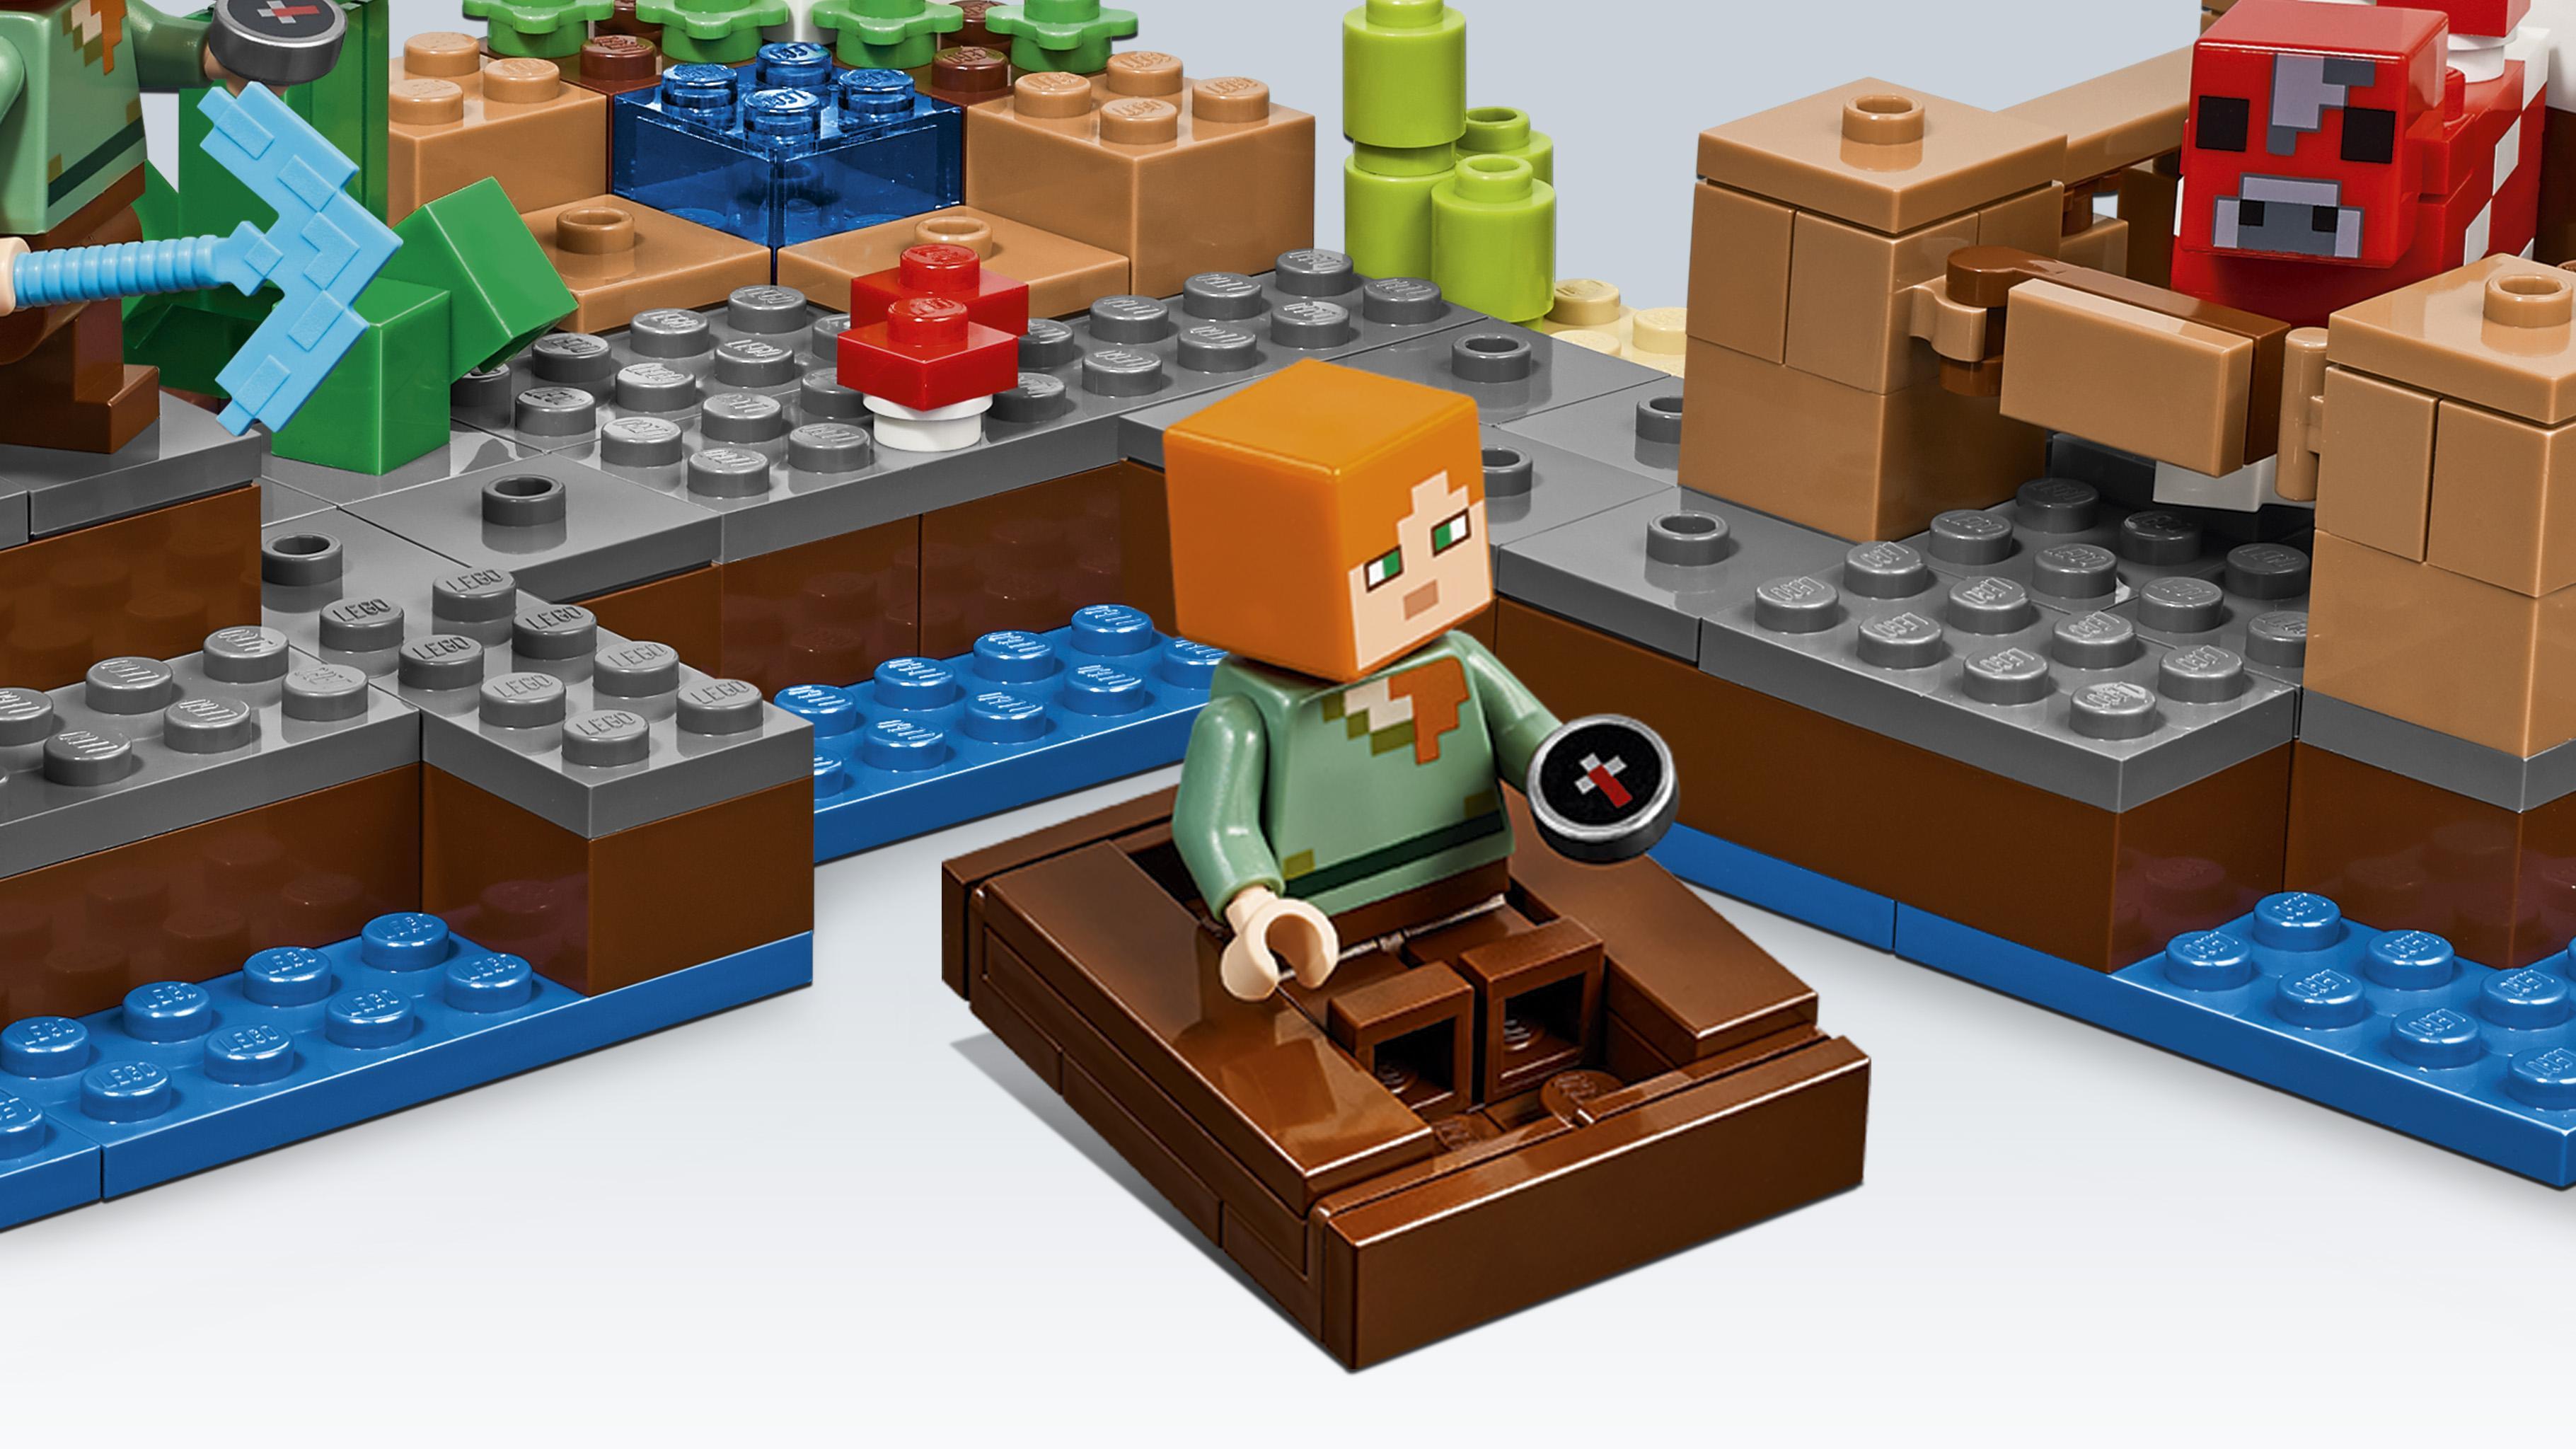 Lego Minecraft The Mushroom Island View Larger 21134 Waterfall Base